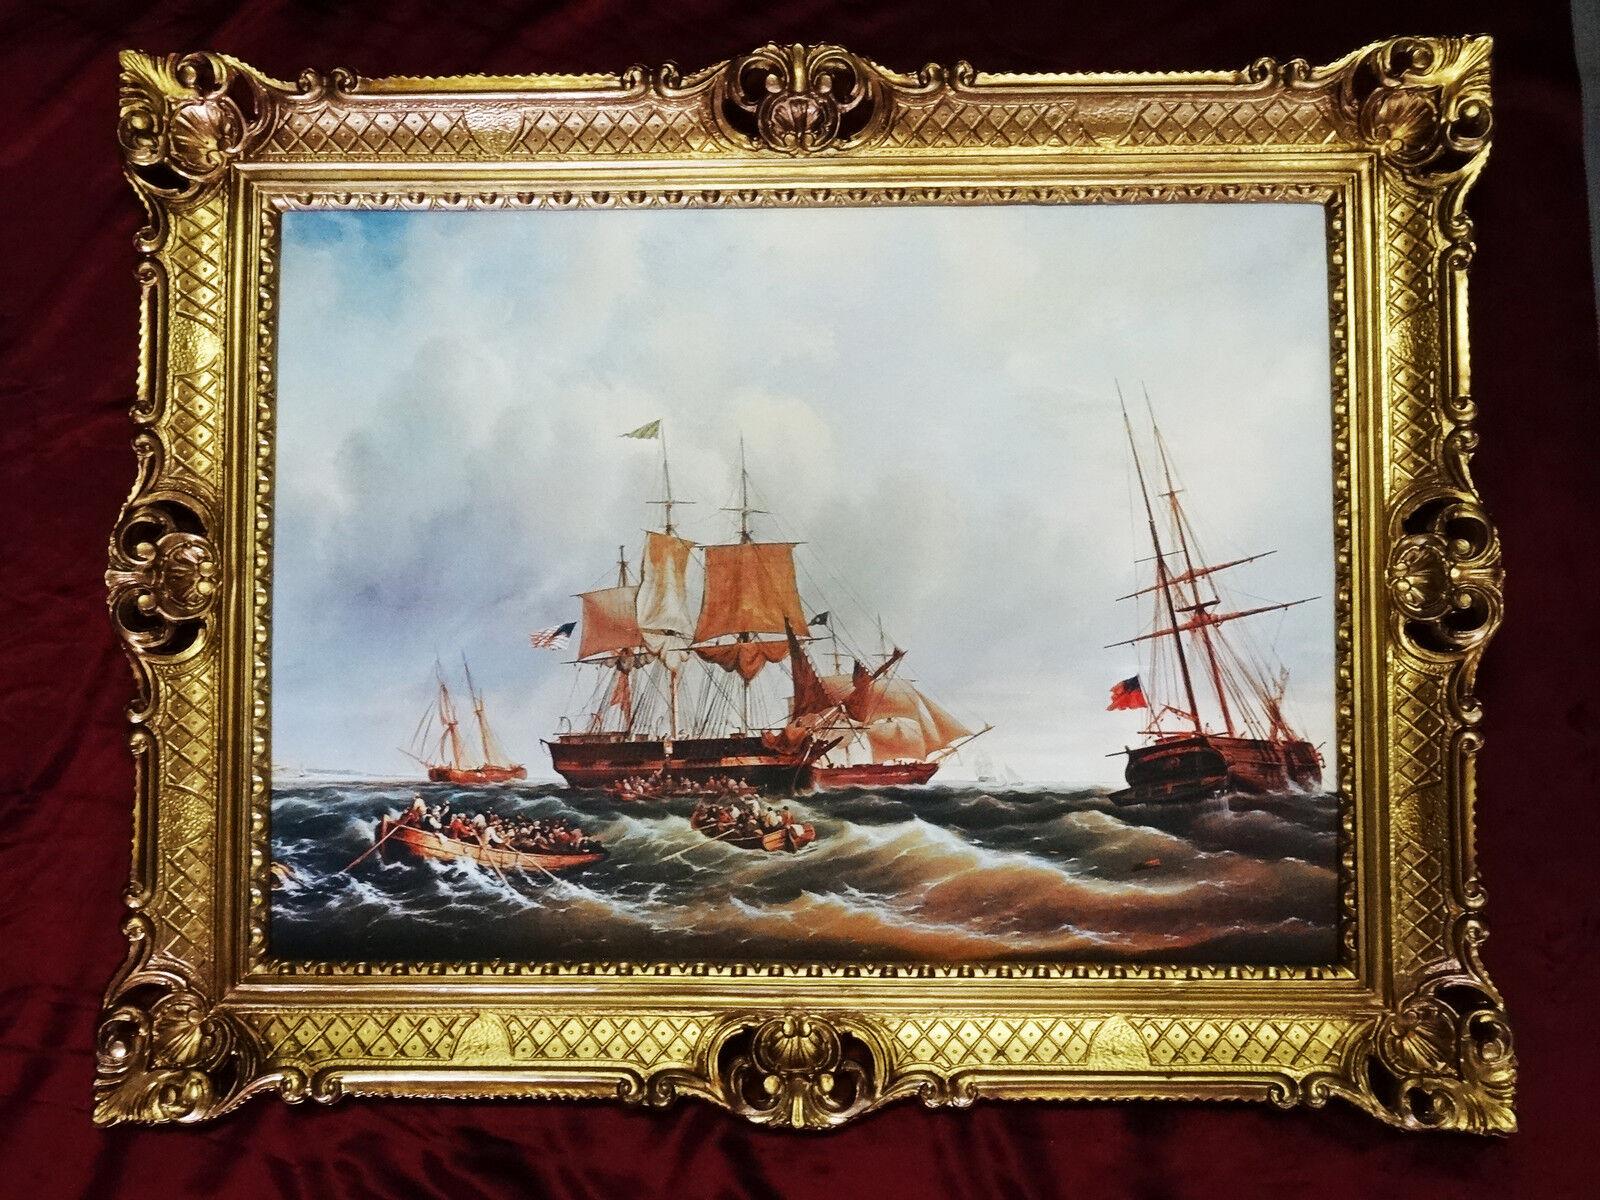 Bilderrahmen gem lde schiff segelschiff antik barock 90x70 for Couchtisch 90x70